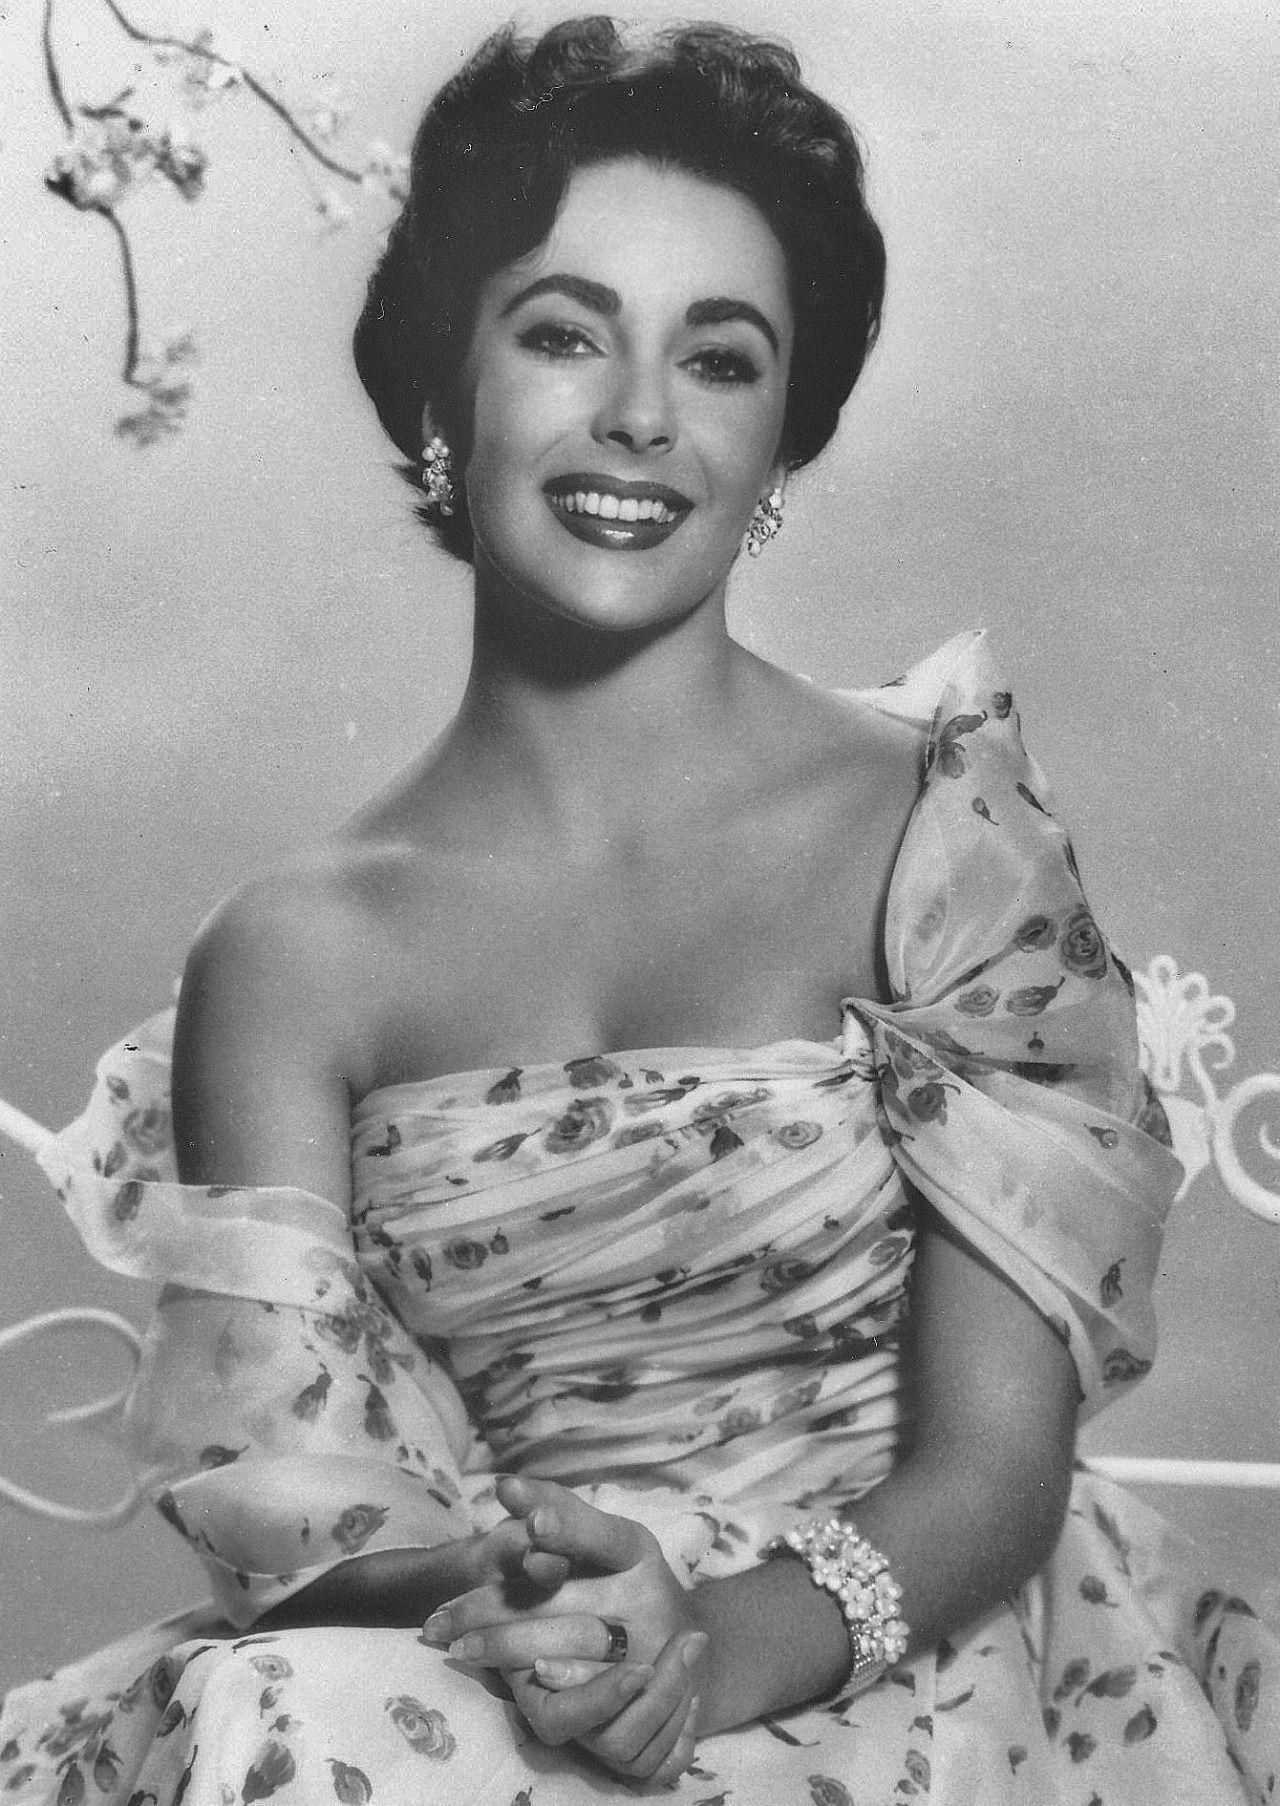 elizabeth taylor, 1950s | beautiful liz taylor | elizabeth